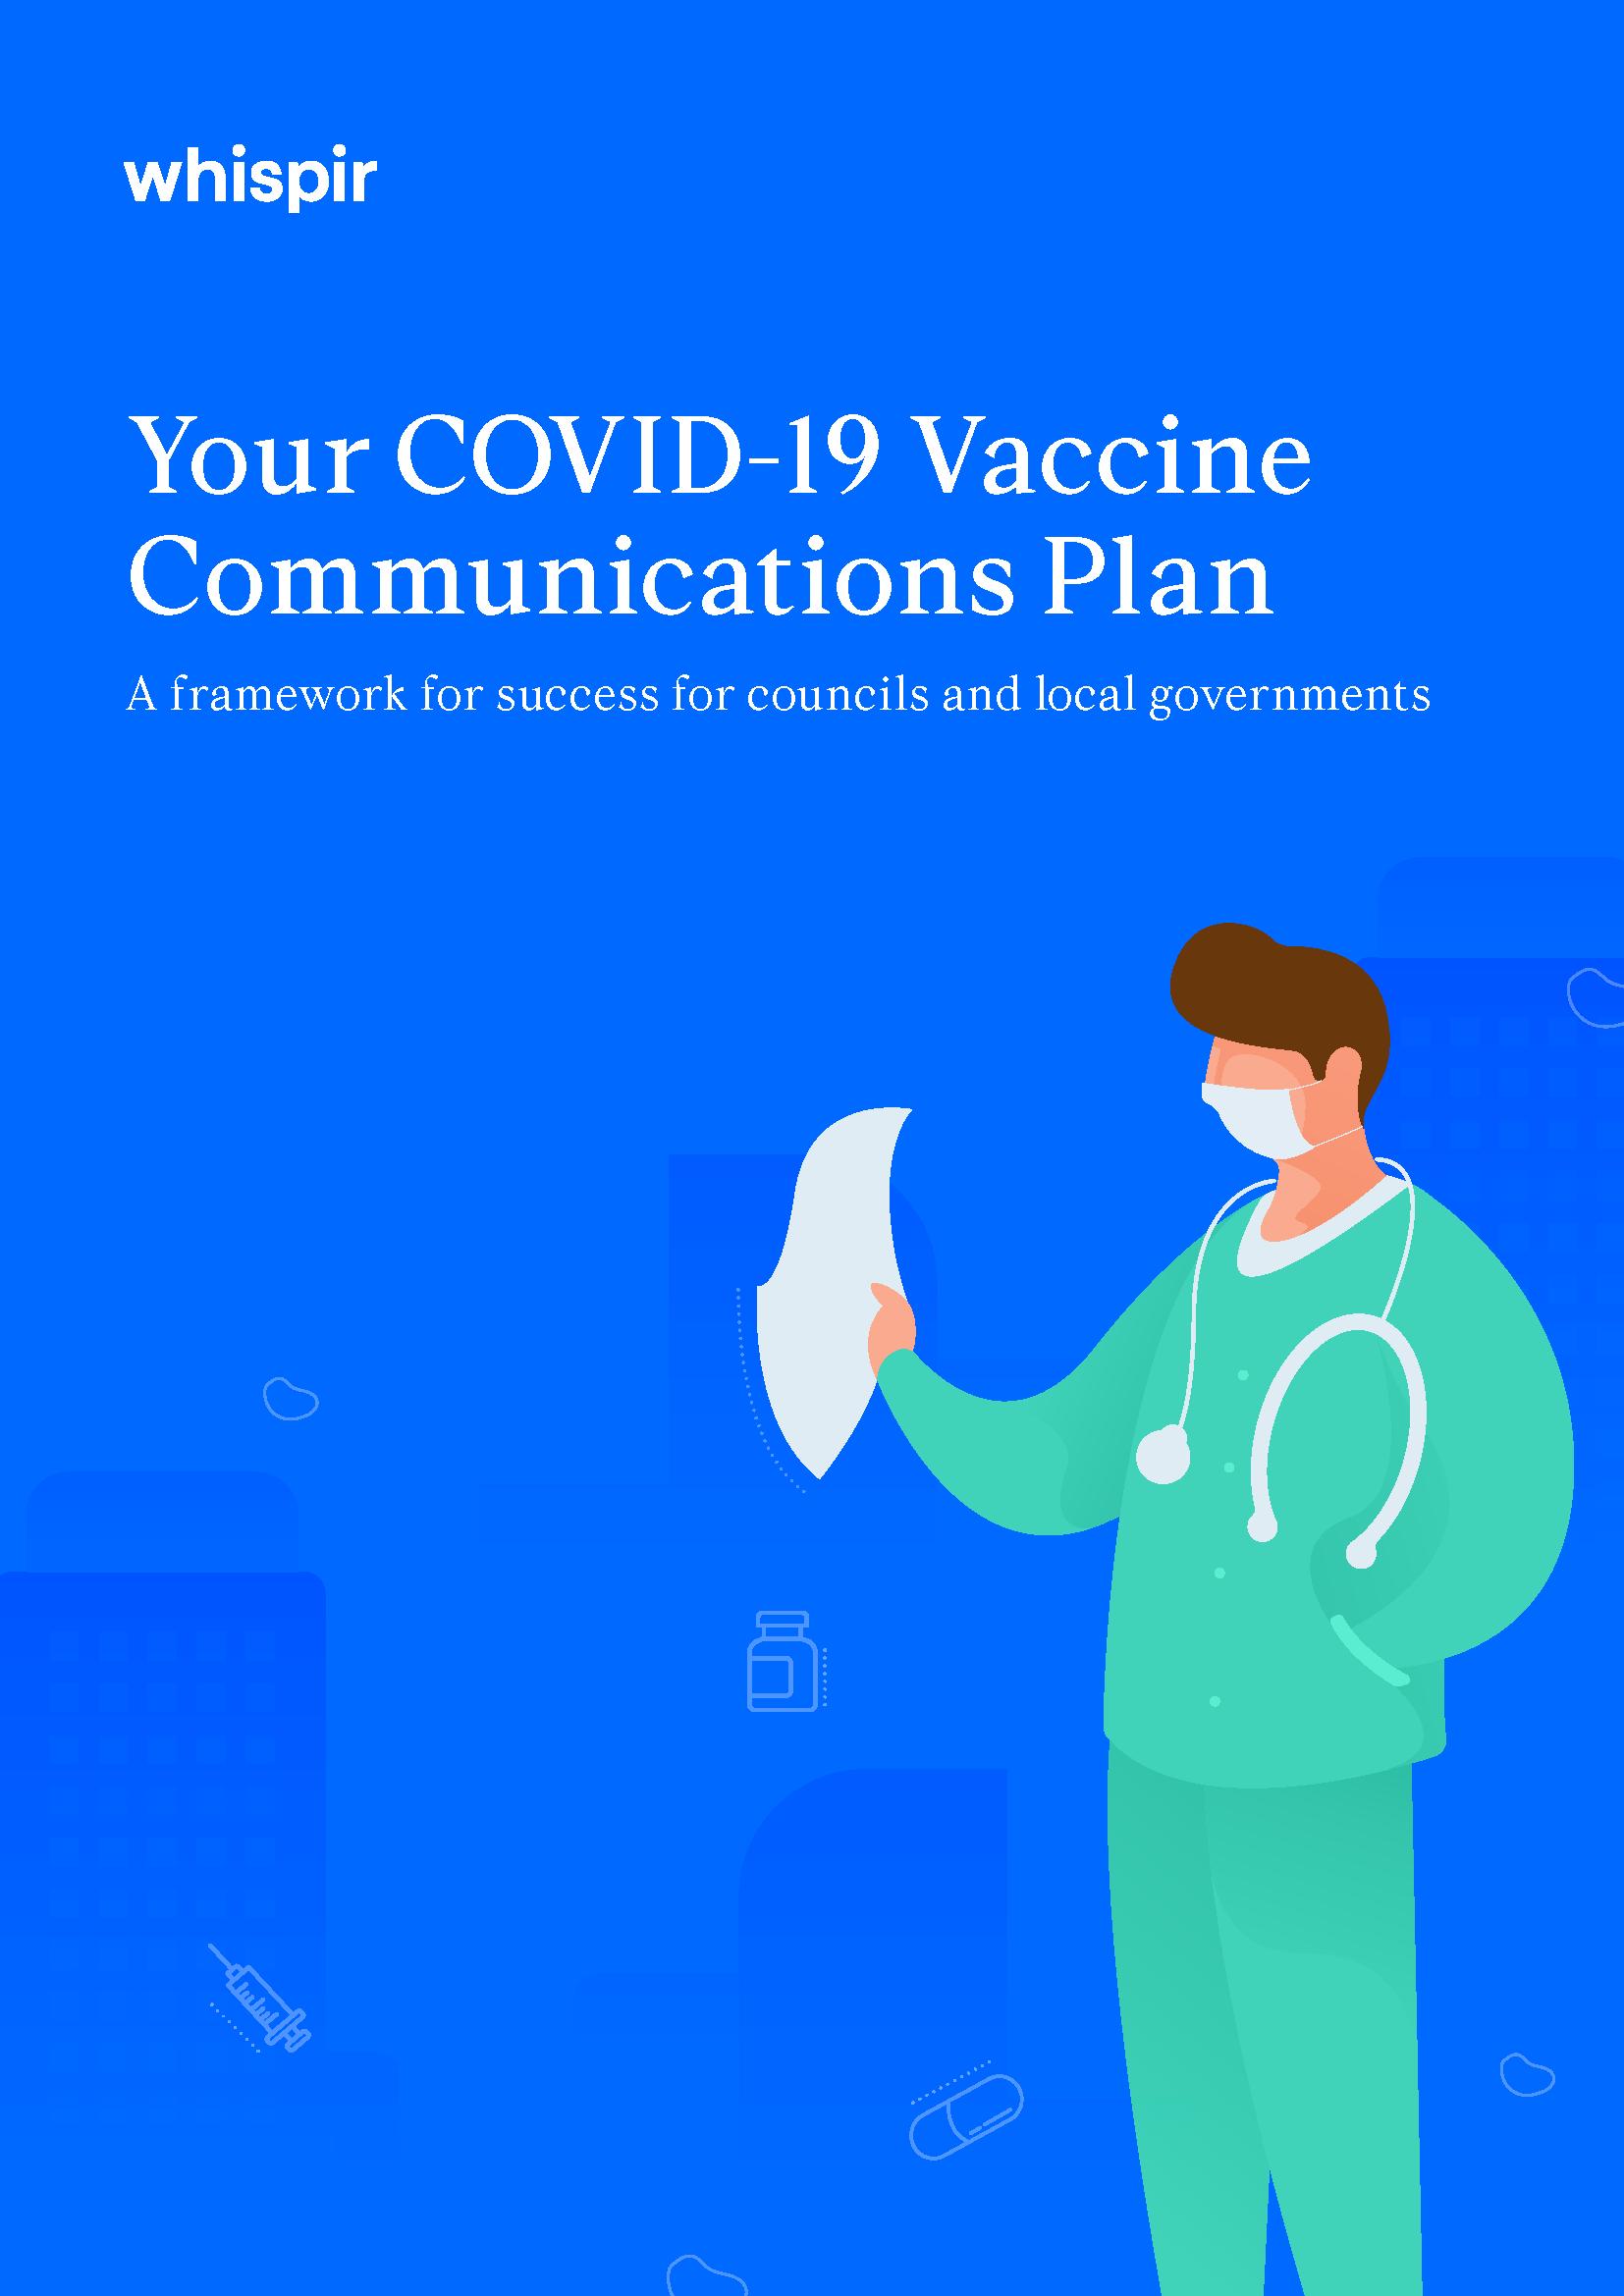 Covid Vaccine AU Image